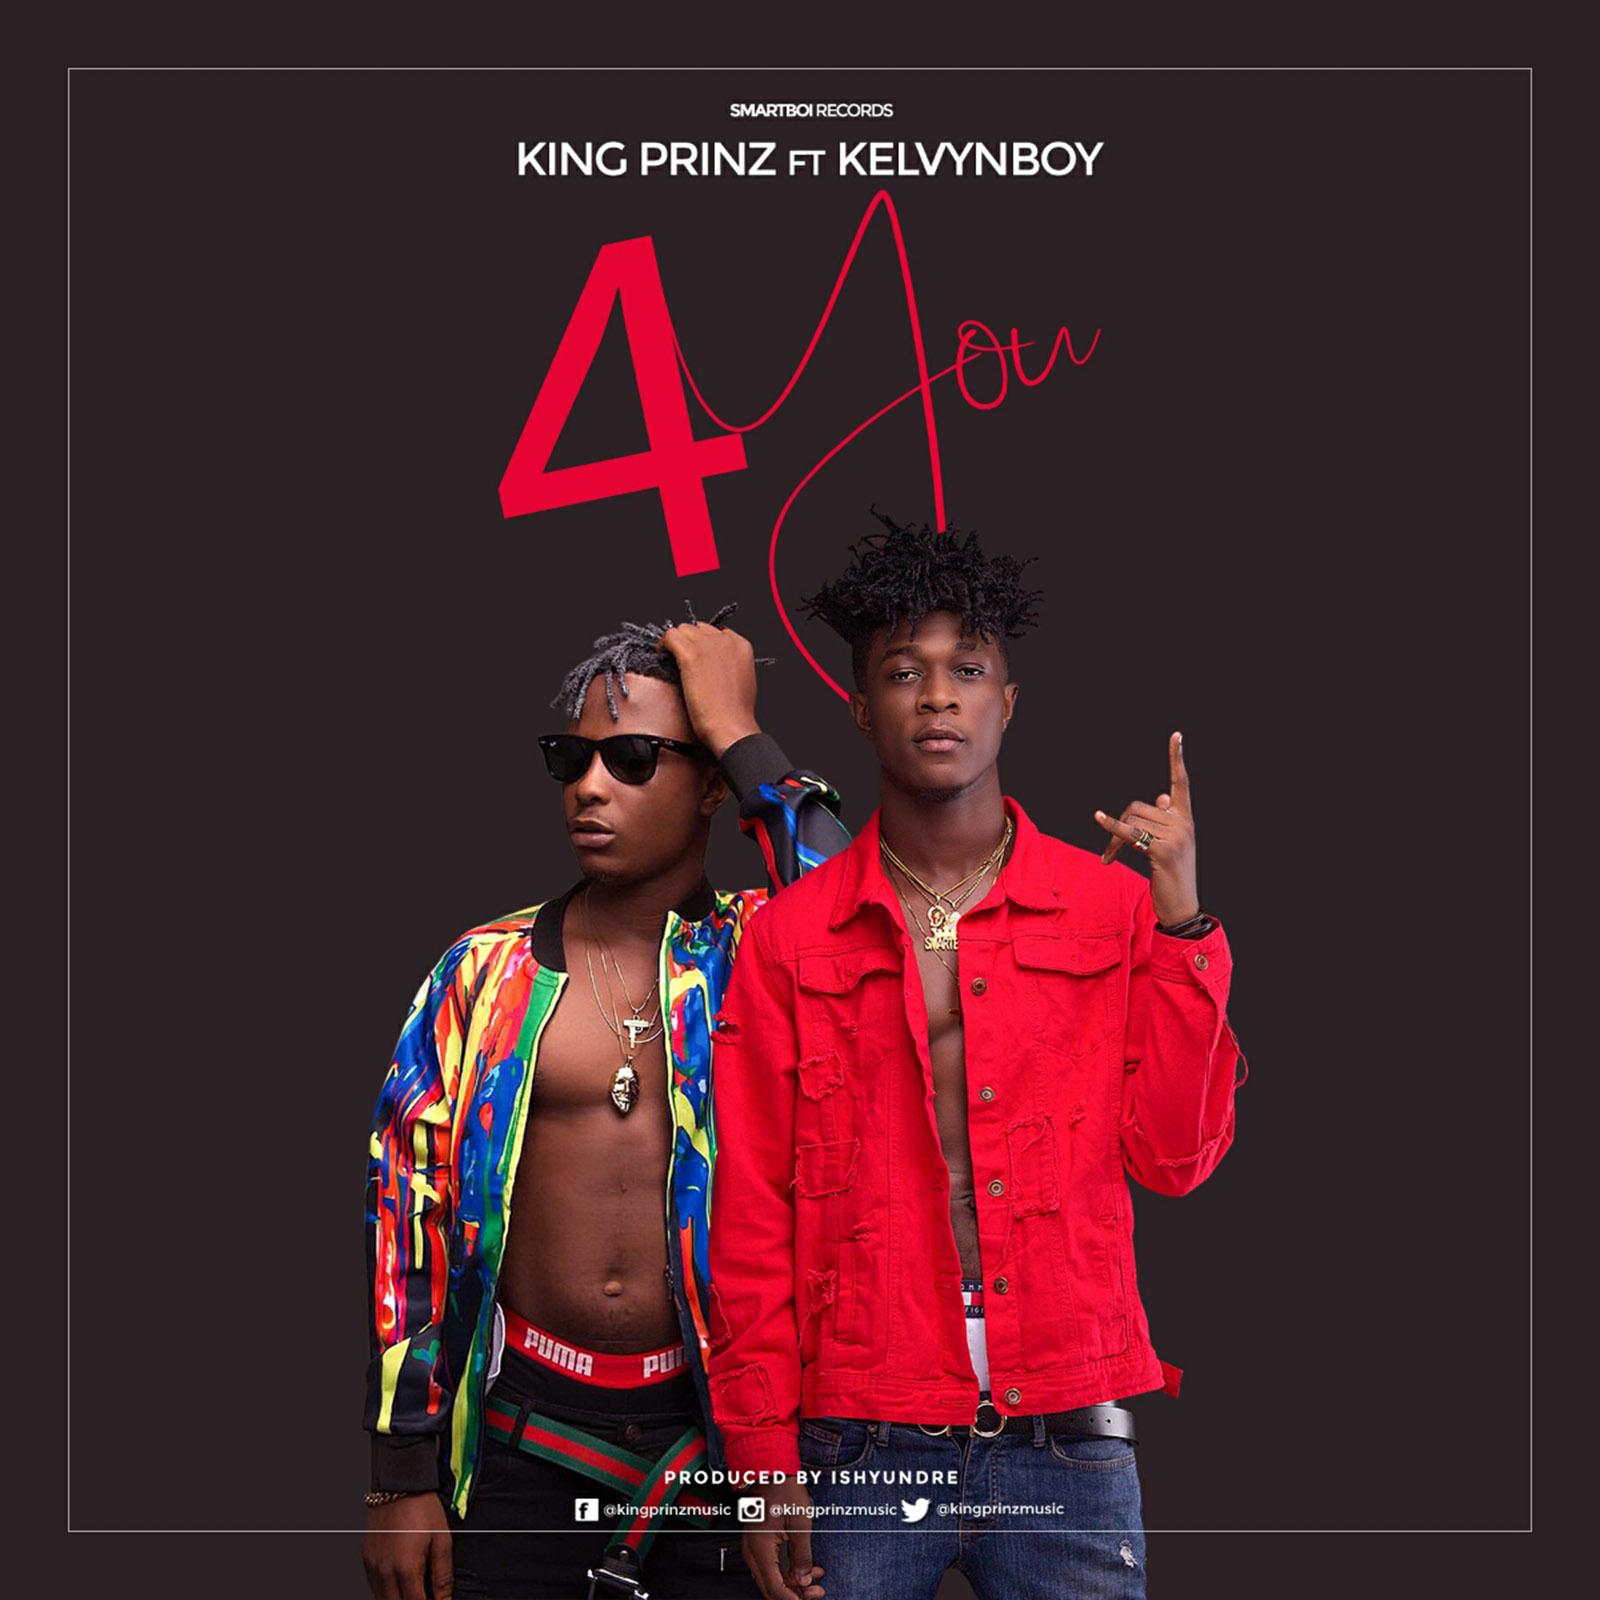 4 You by King Prinz feat. Kelvynboy